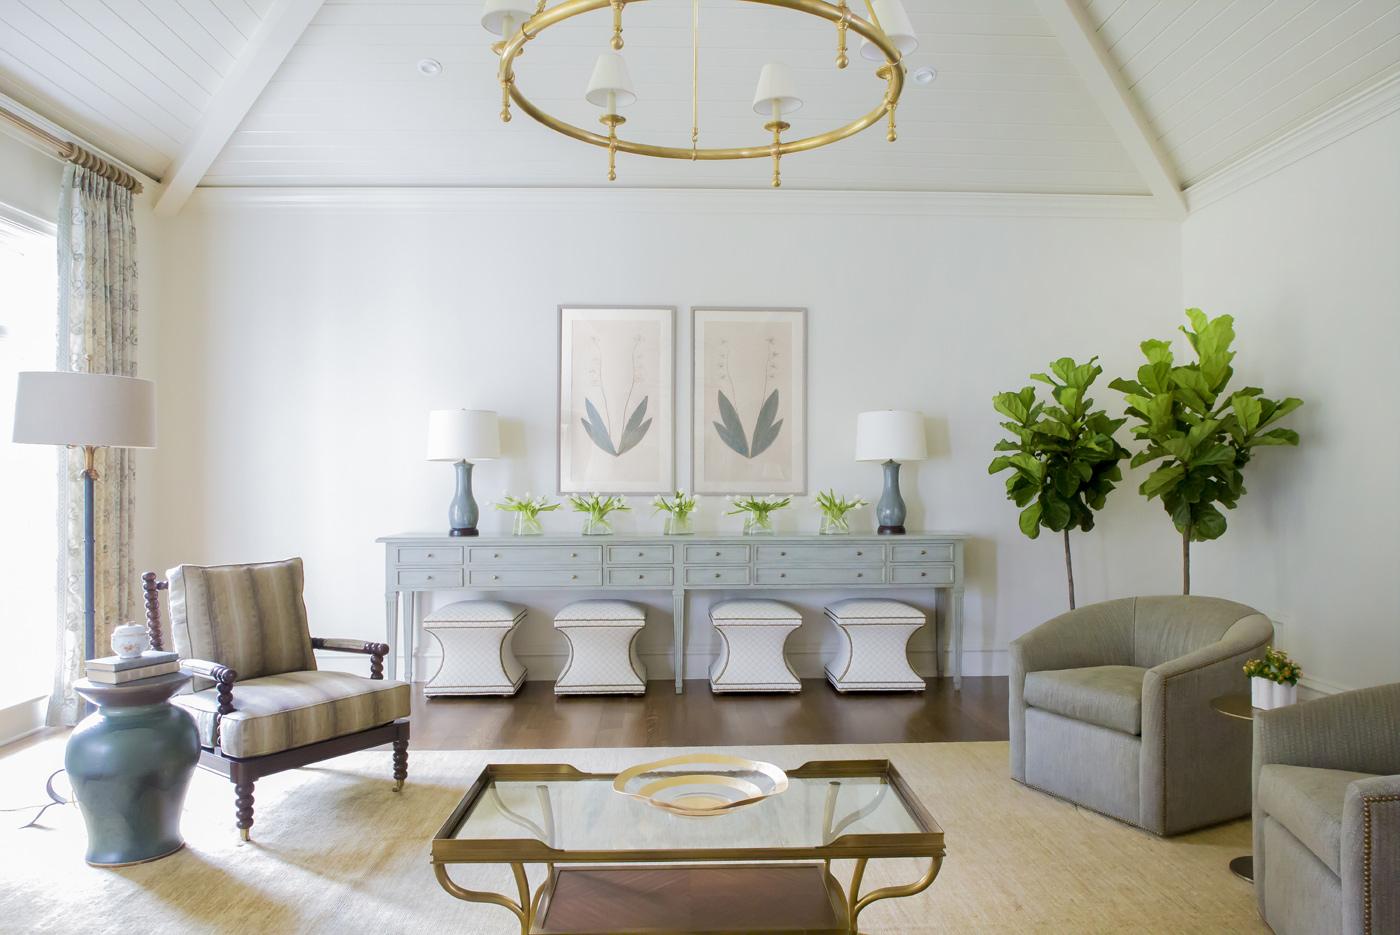 Cindy-McCord-Interior-Design-Collierville-House-001.jpg